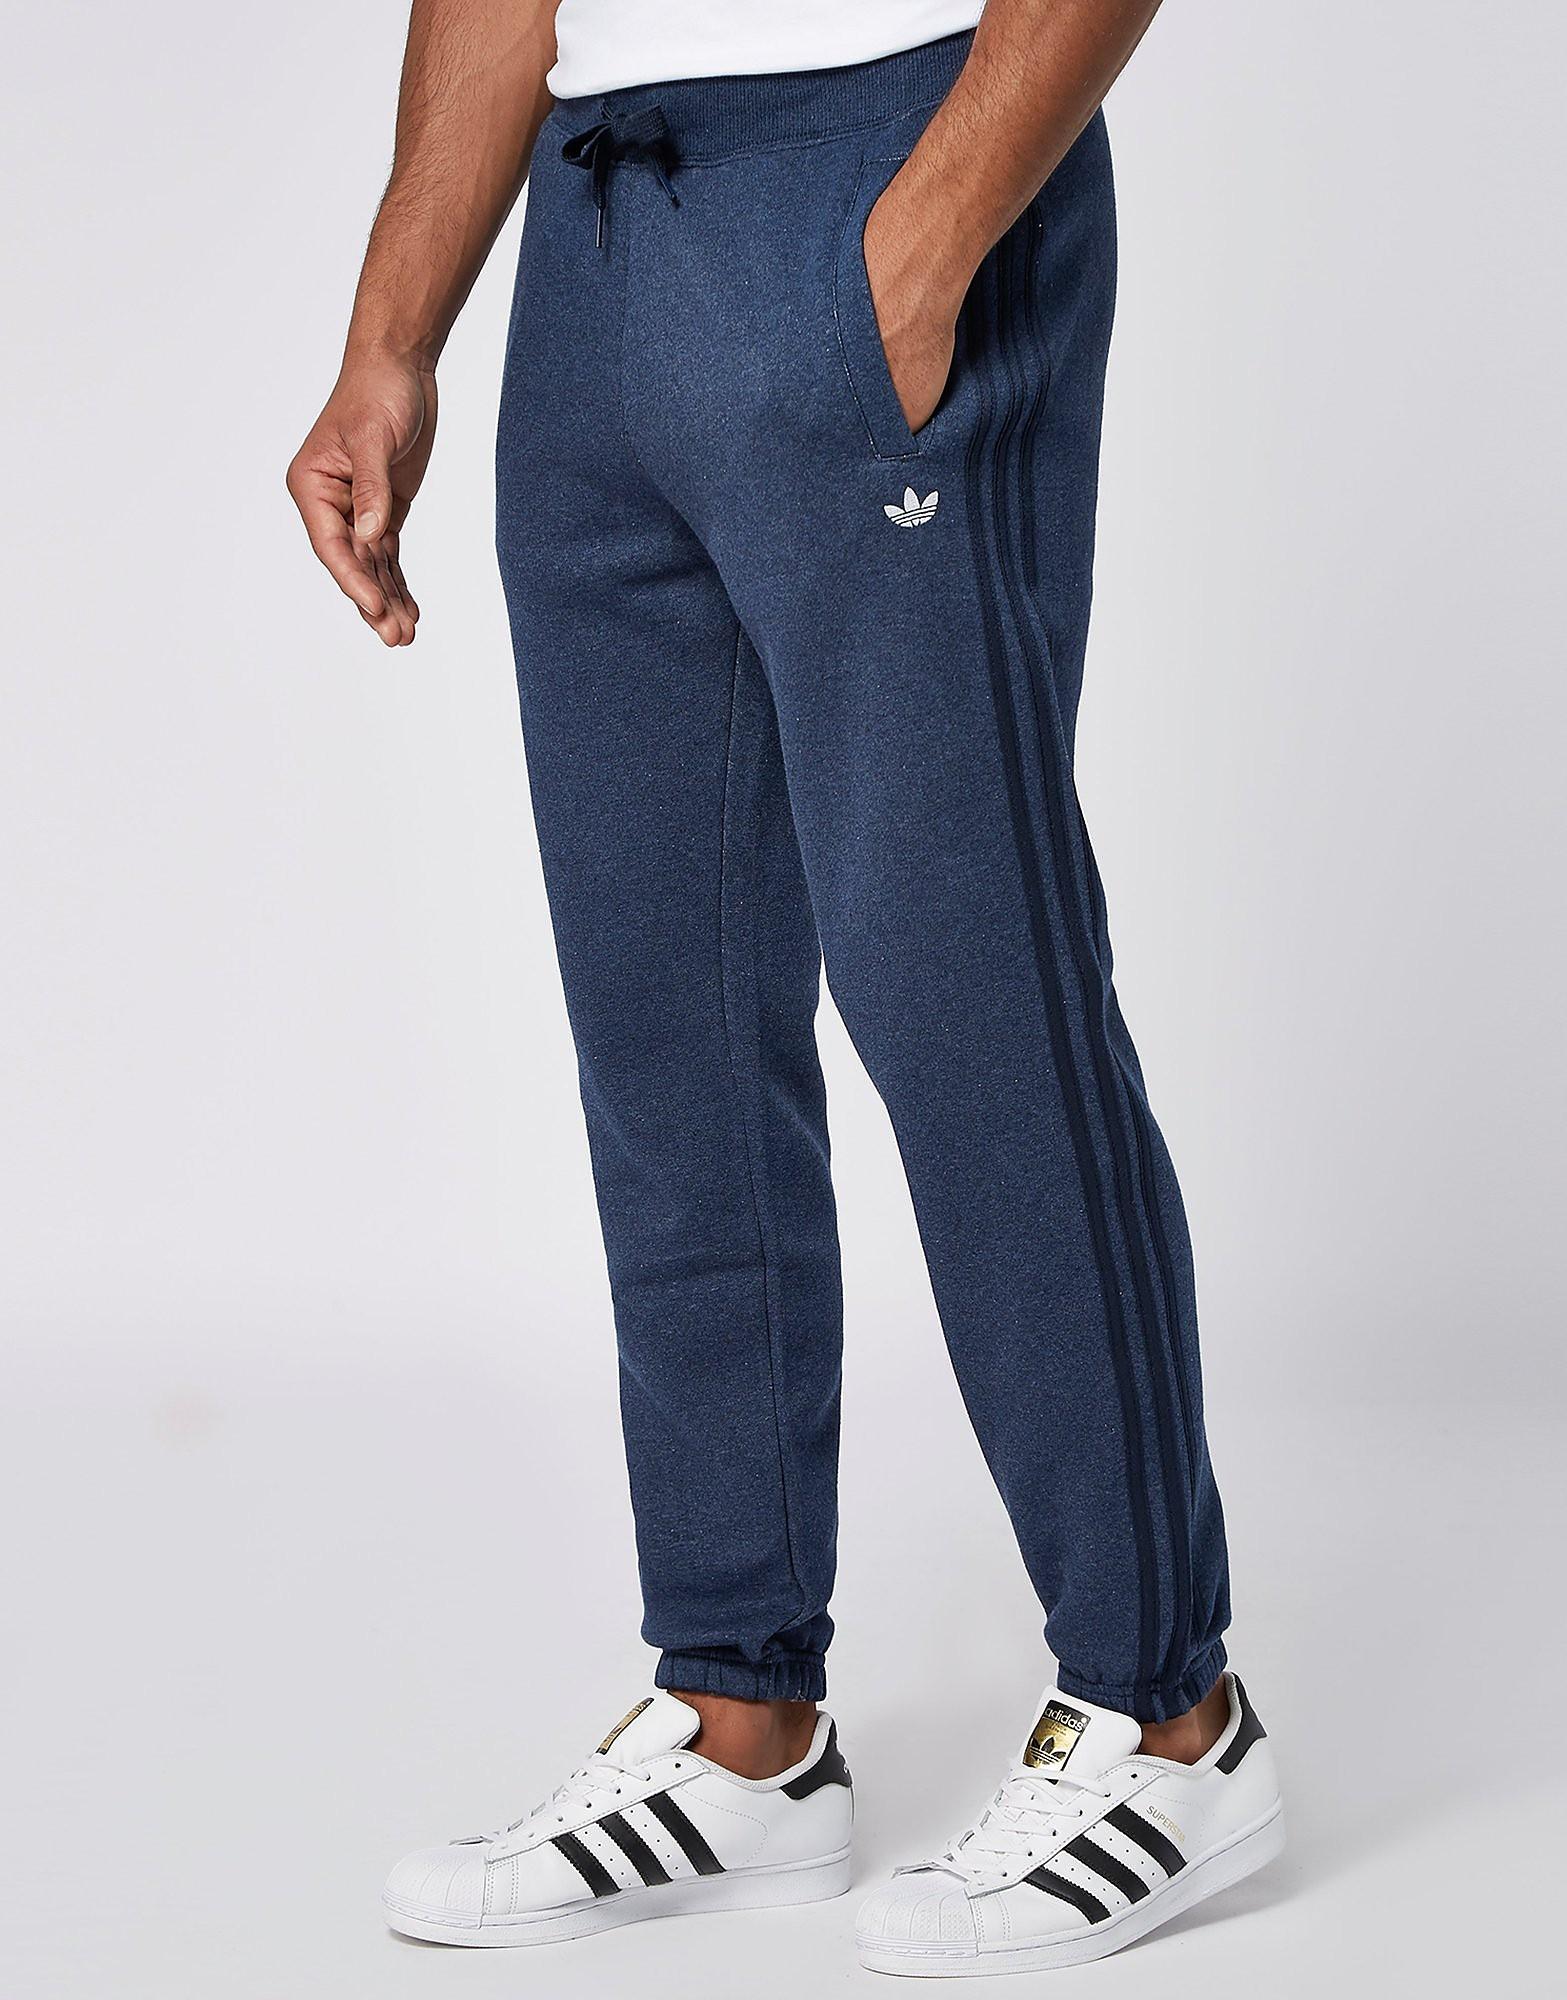 adidas Originals Sport Cuff Pants